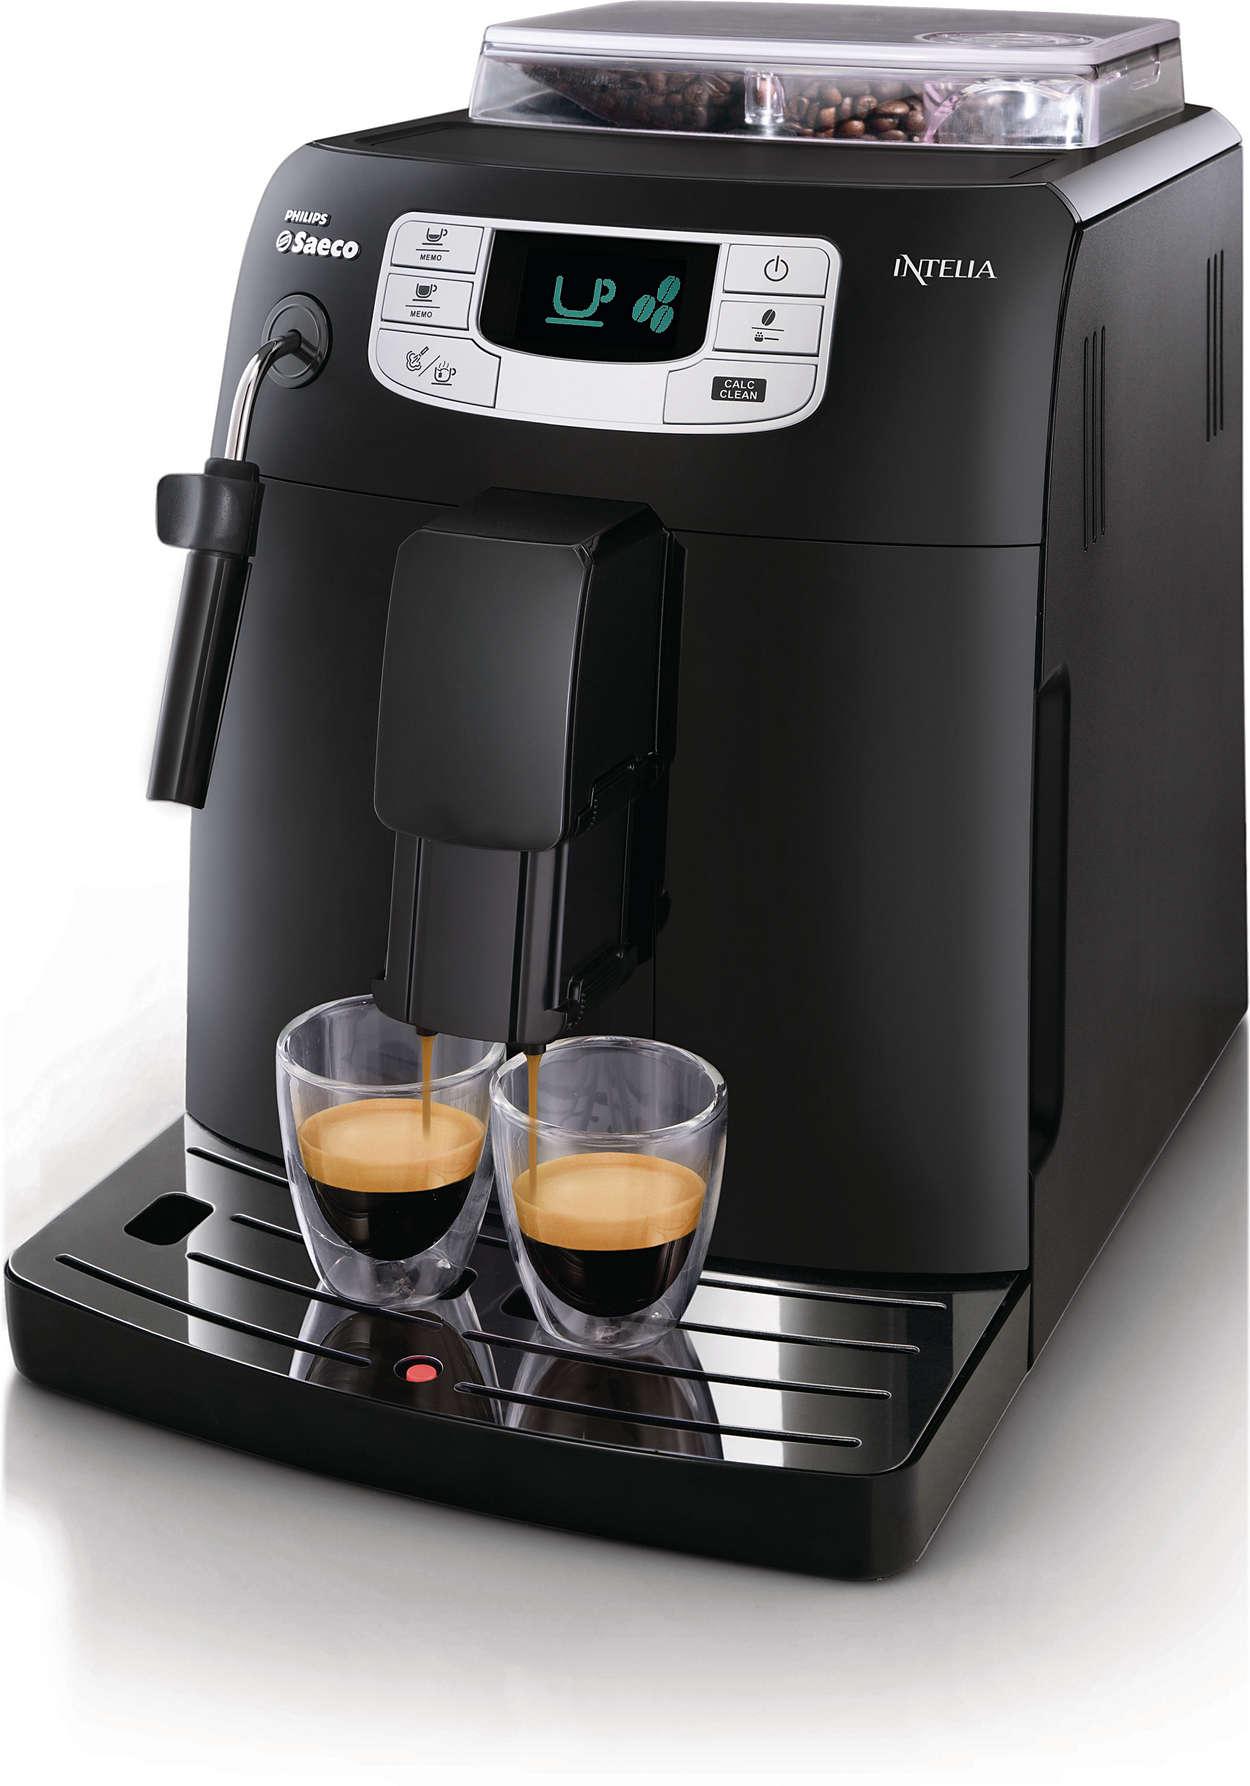 Un authentique espresso